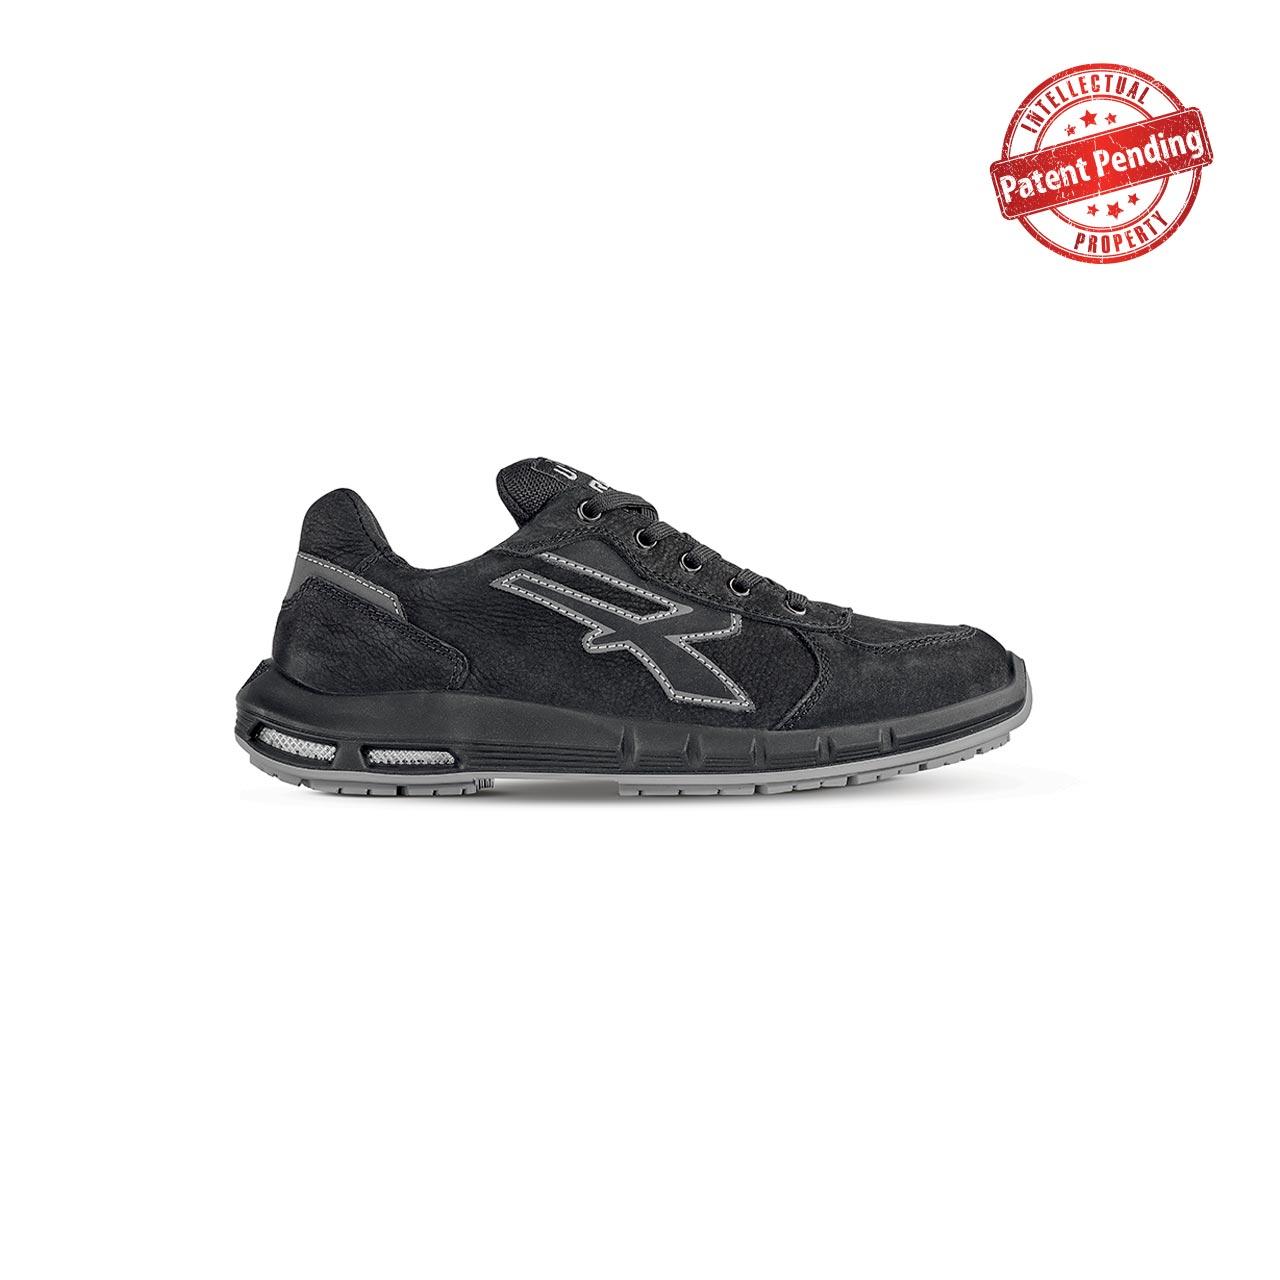 scarpa antinfortunistica upower modello shedir plus linea redup plus vista laterale